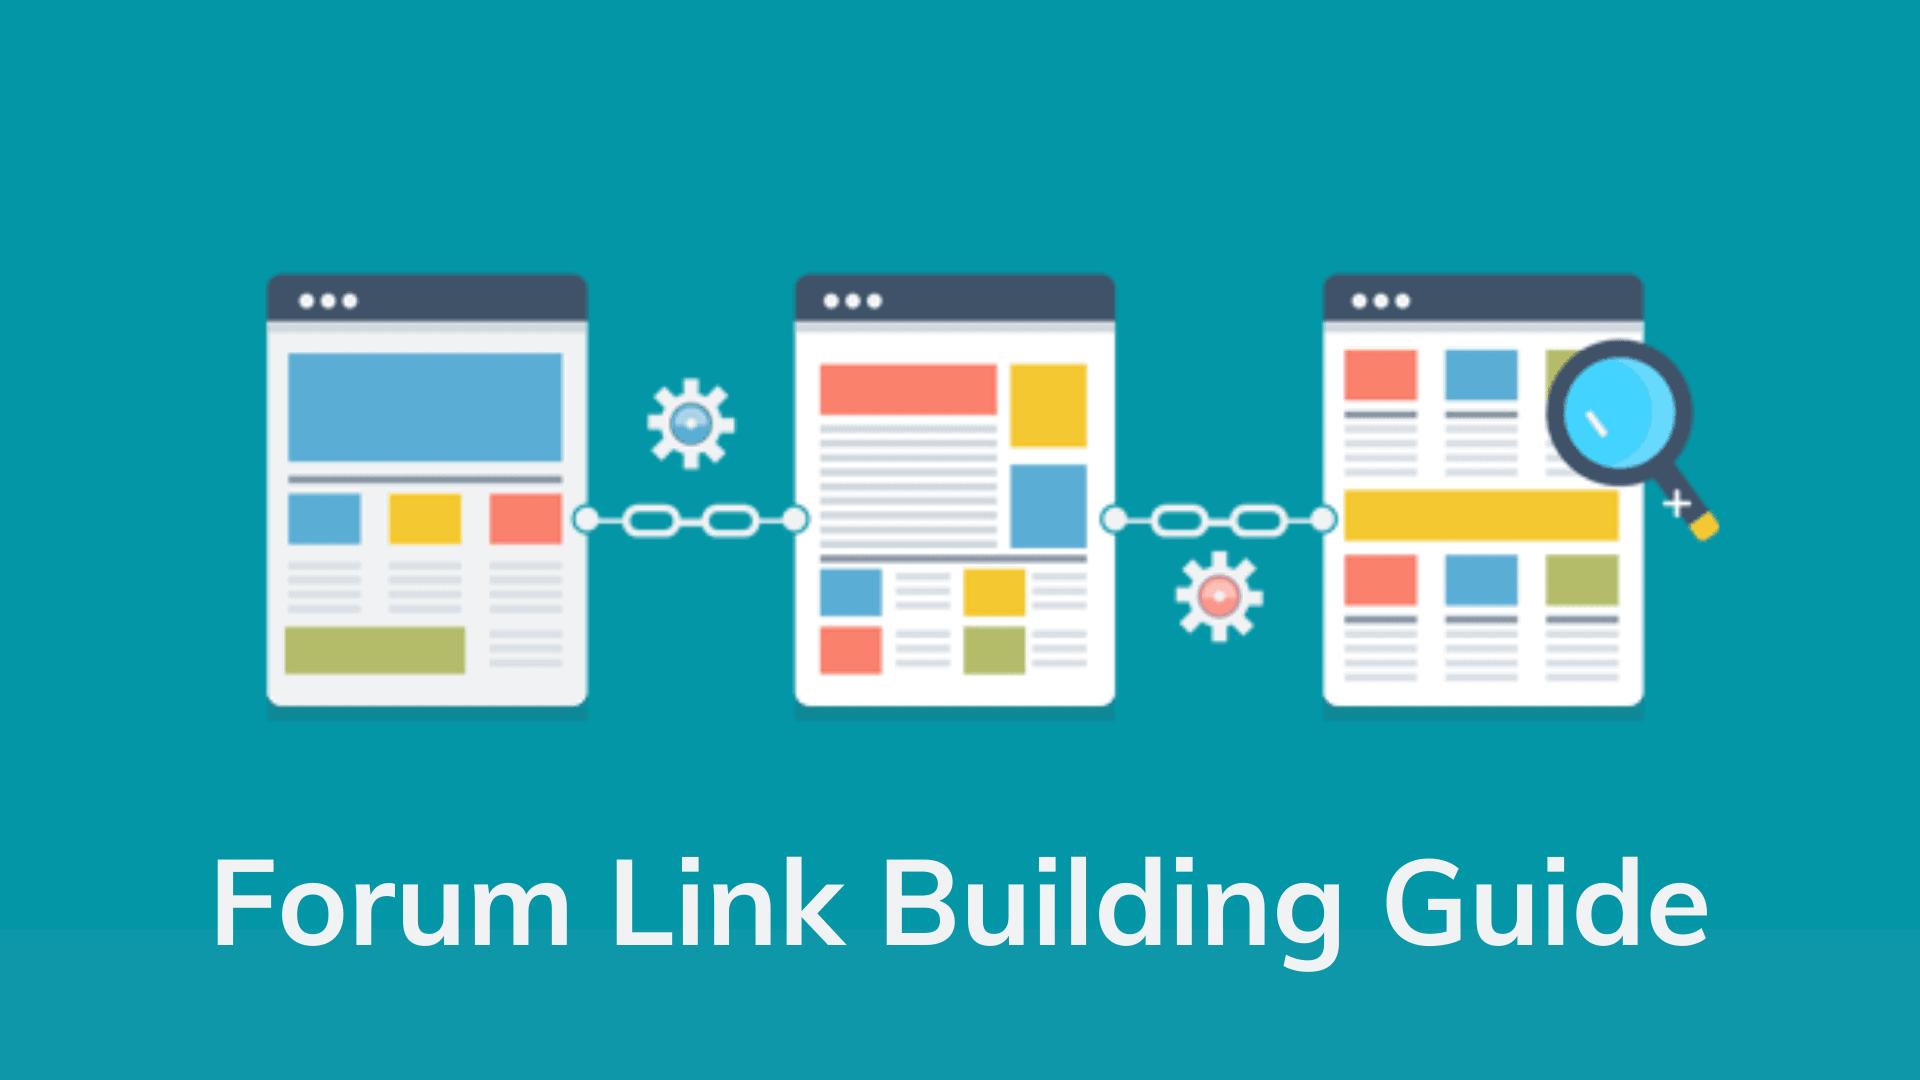 forum-link-building-guide